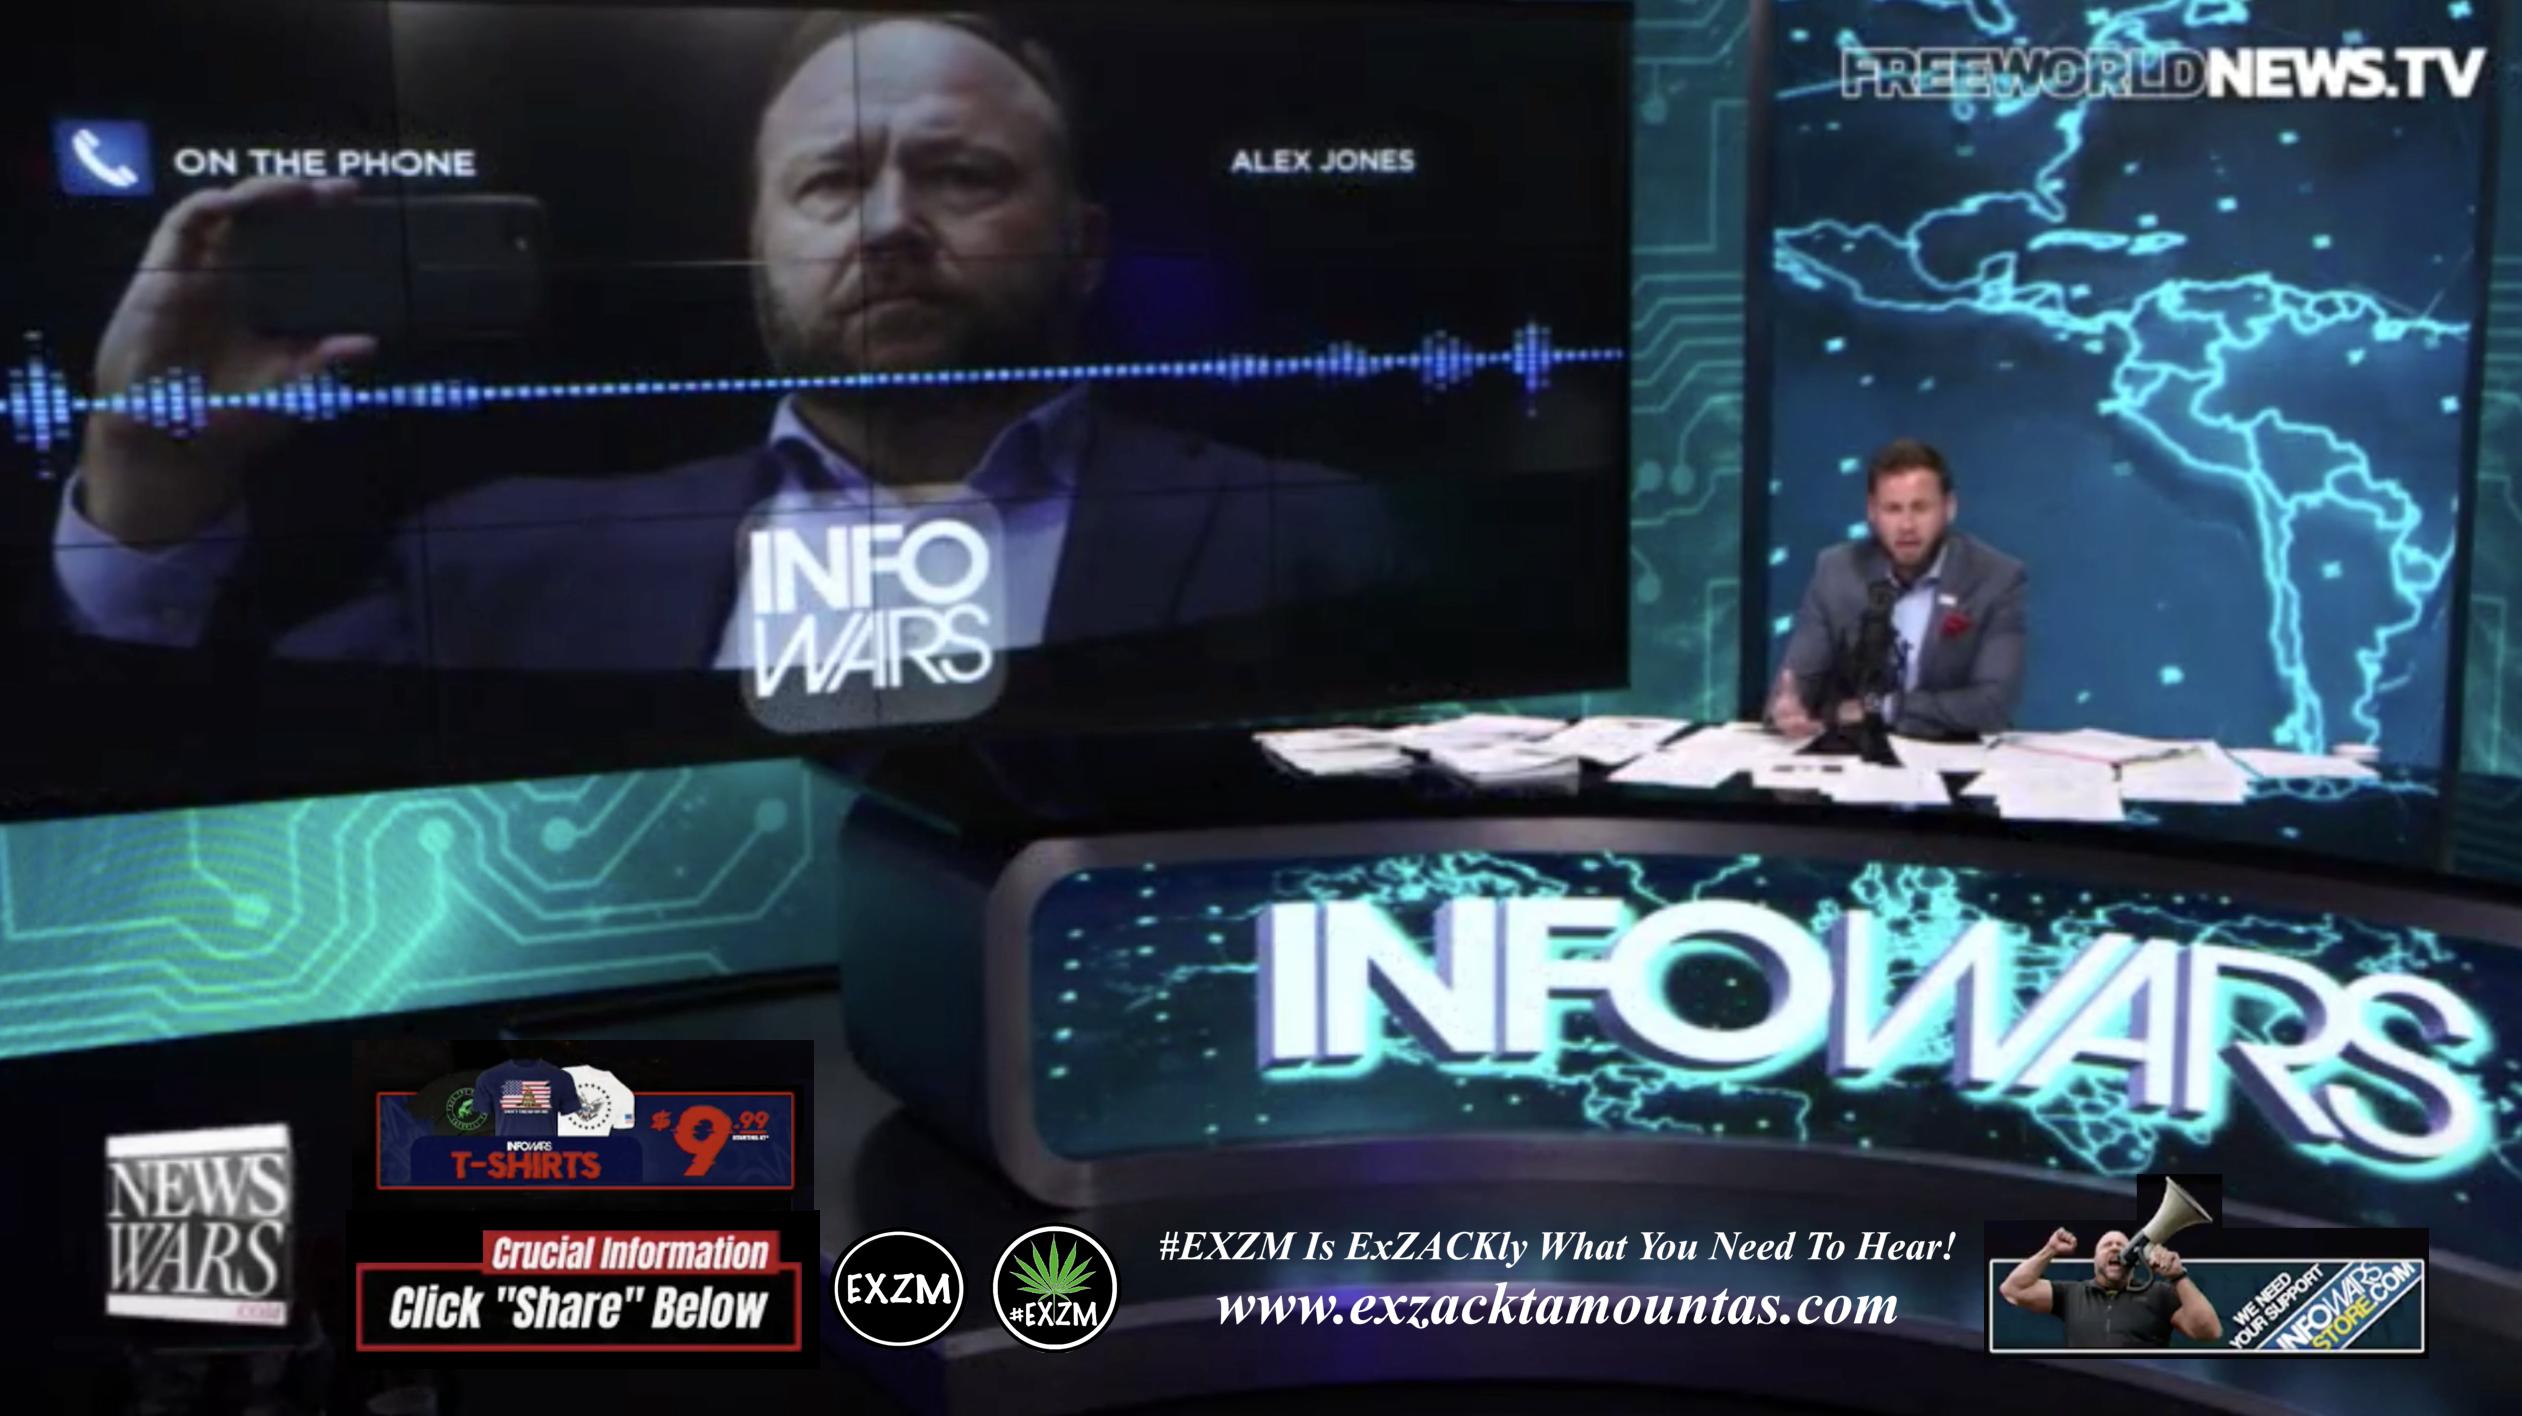 Alex Jones Owen Shroyer Live In Infowars Studio Free World News TV EXZM Zack Mount September 19th 2021 copy